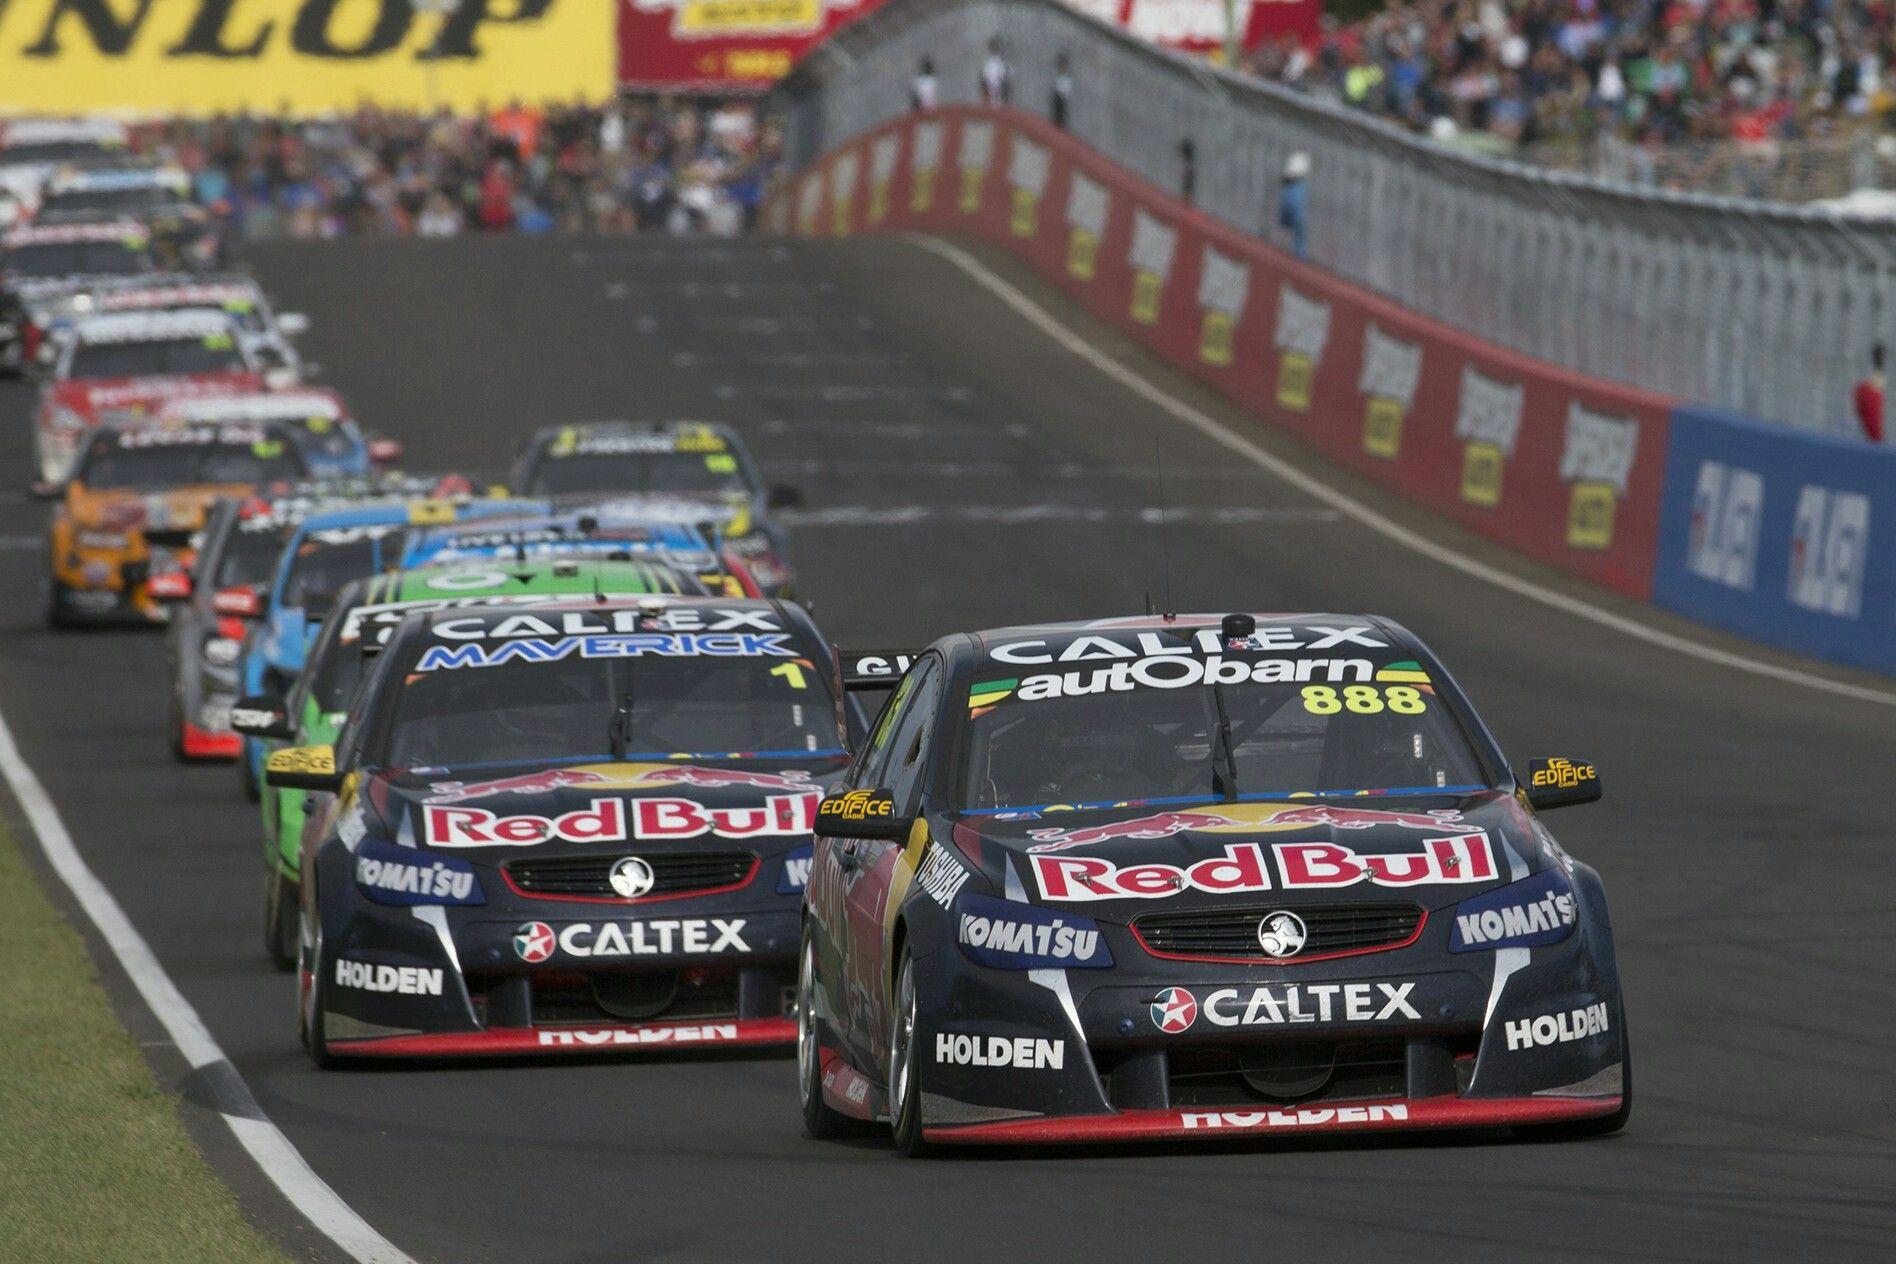 2015 Supercheap Auto Bathurst 1000 V8 Supercars Red Bull Racing Holden Racing Bathurst